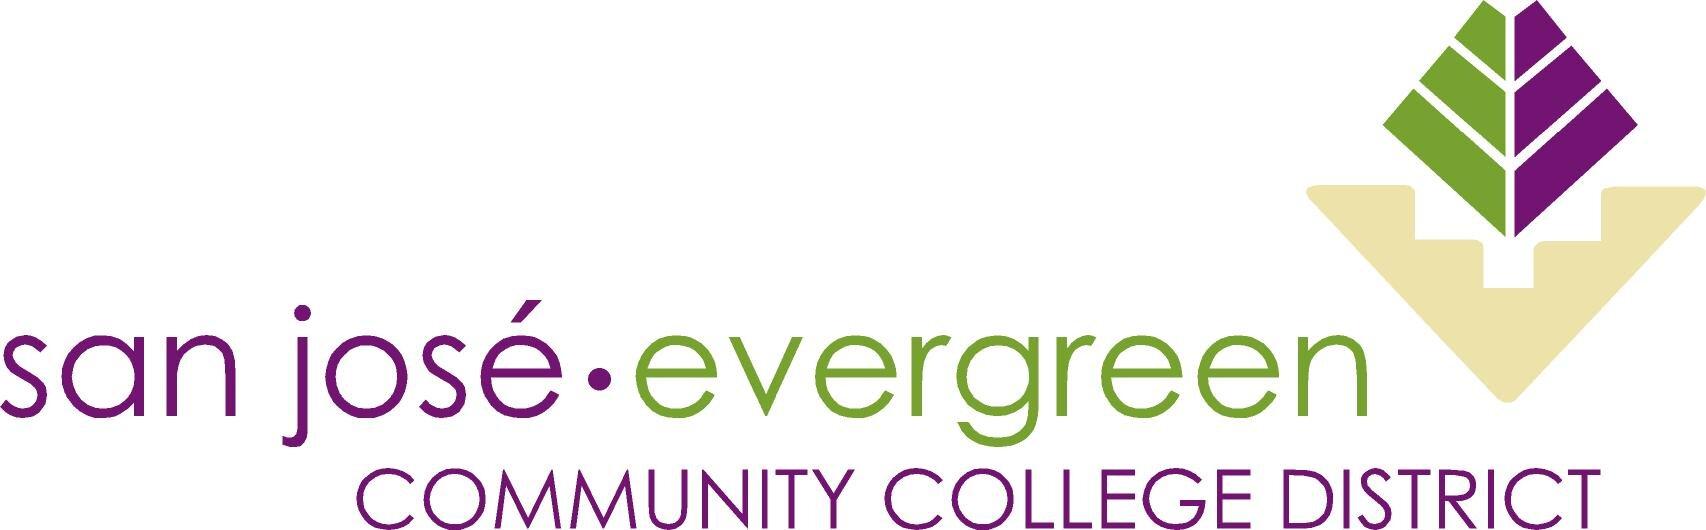 San Jose Evergreen CC Logo.jpg